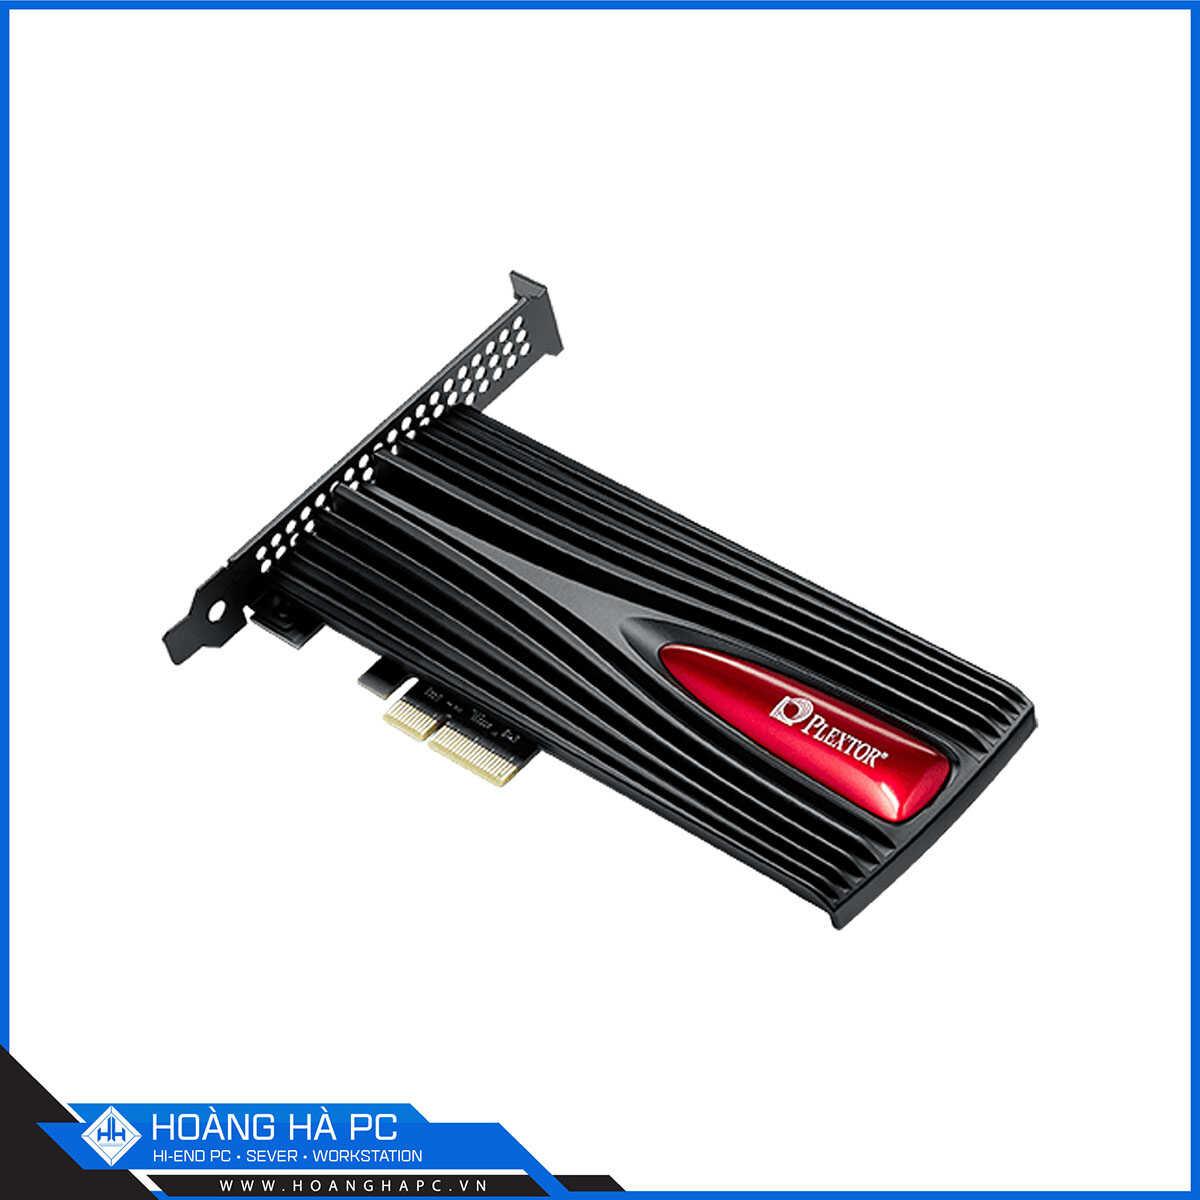 SSD Plextor PX-1TM9PeY 1TB